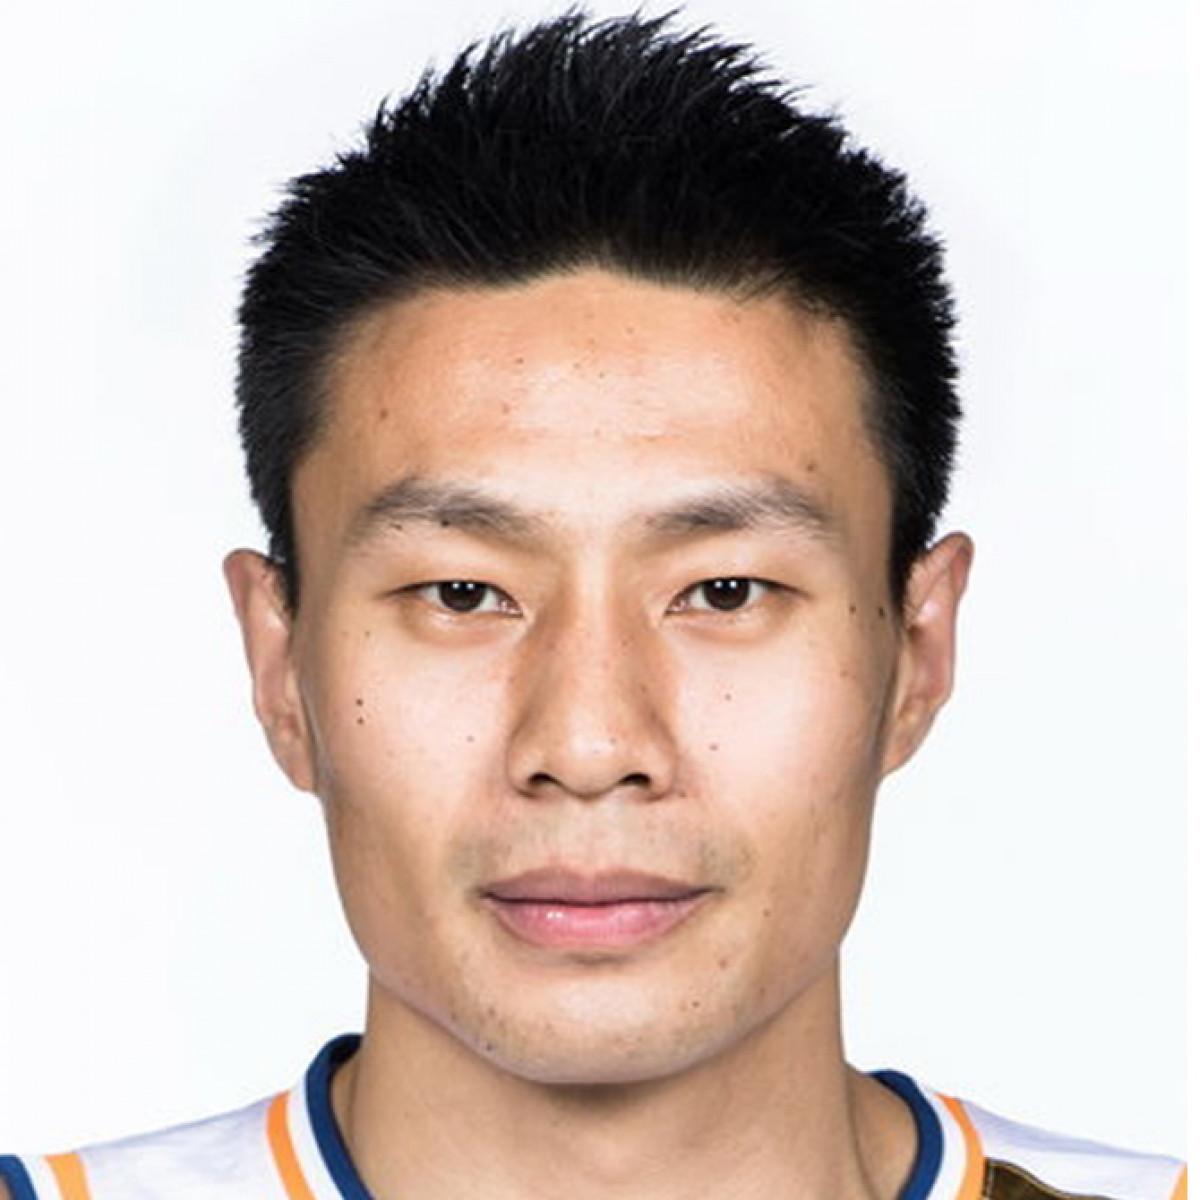 Xudong Luo